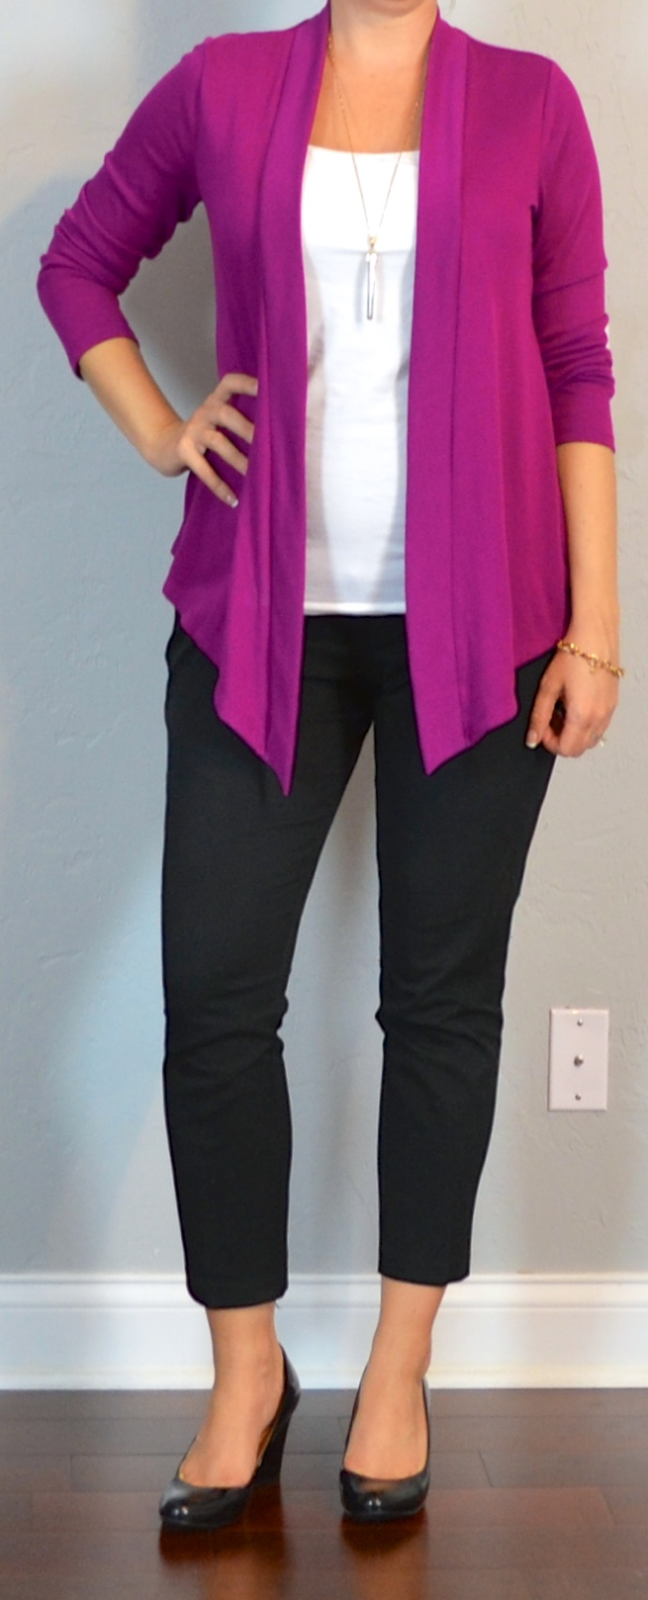 9e3aa9112b9 outfit posts maternity  pink drapey cardigan